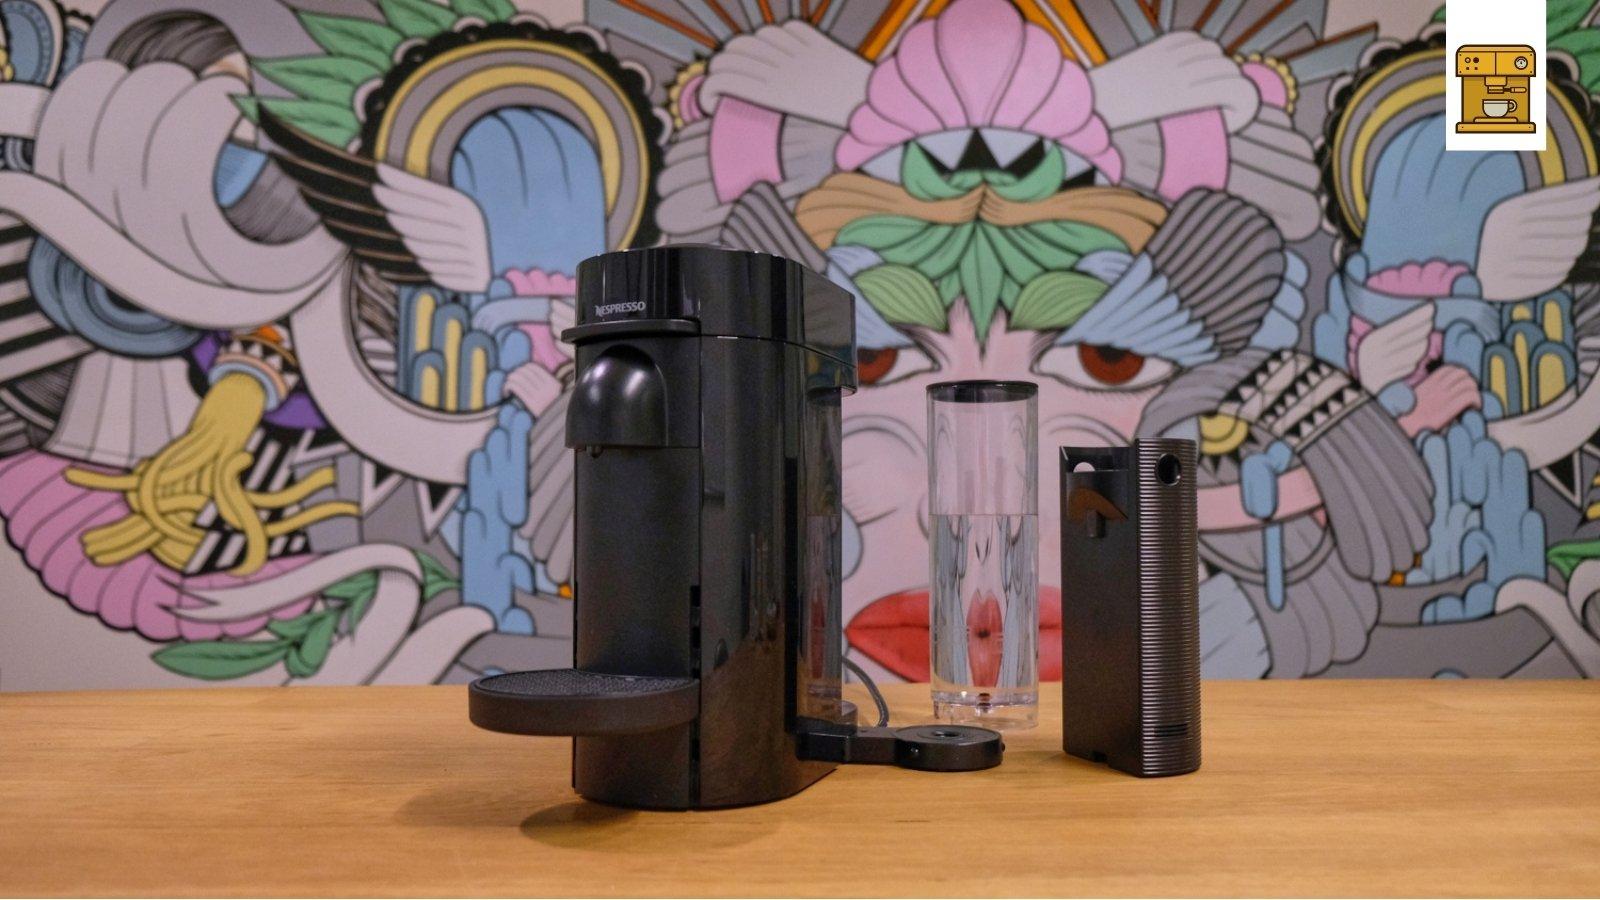 Waterreservoir en opvangbak naast Vertuoline machine